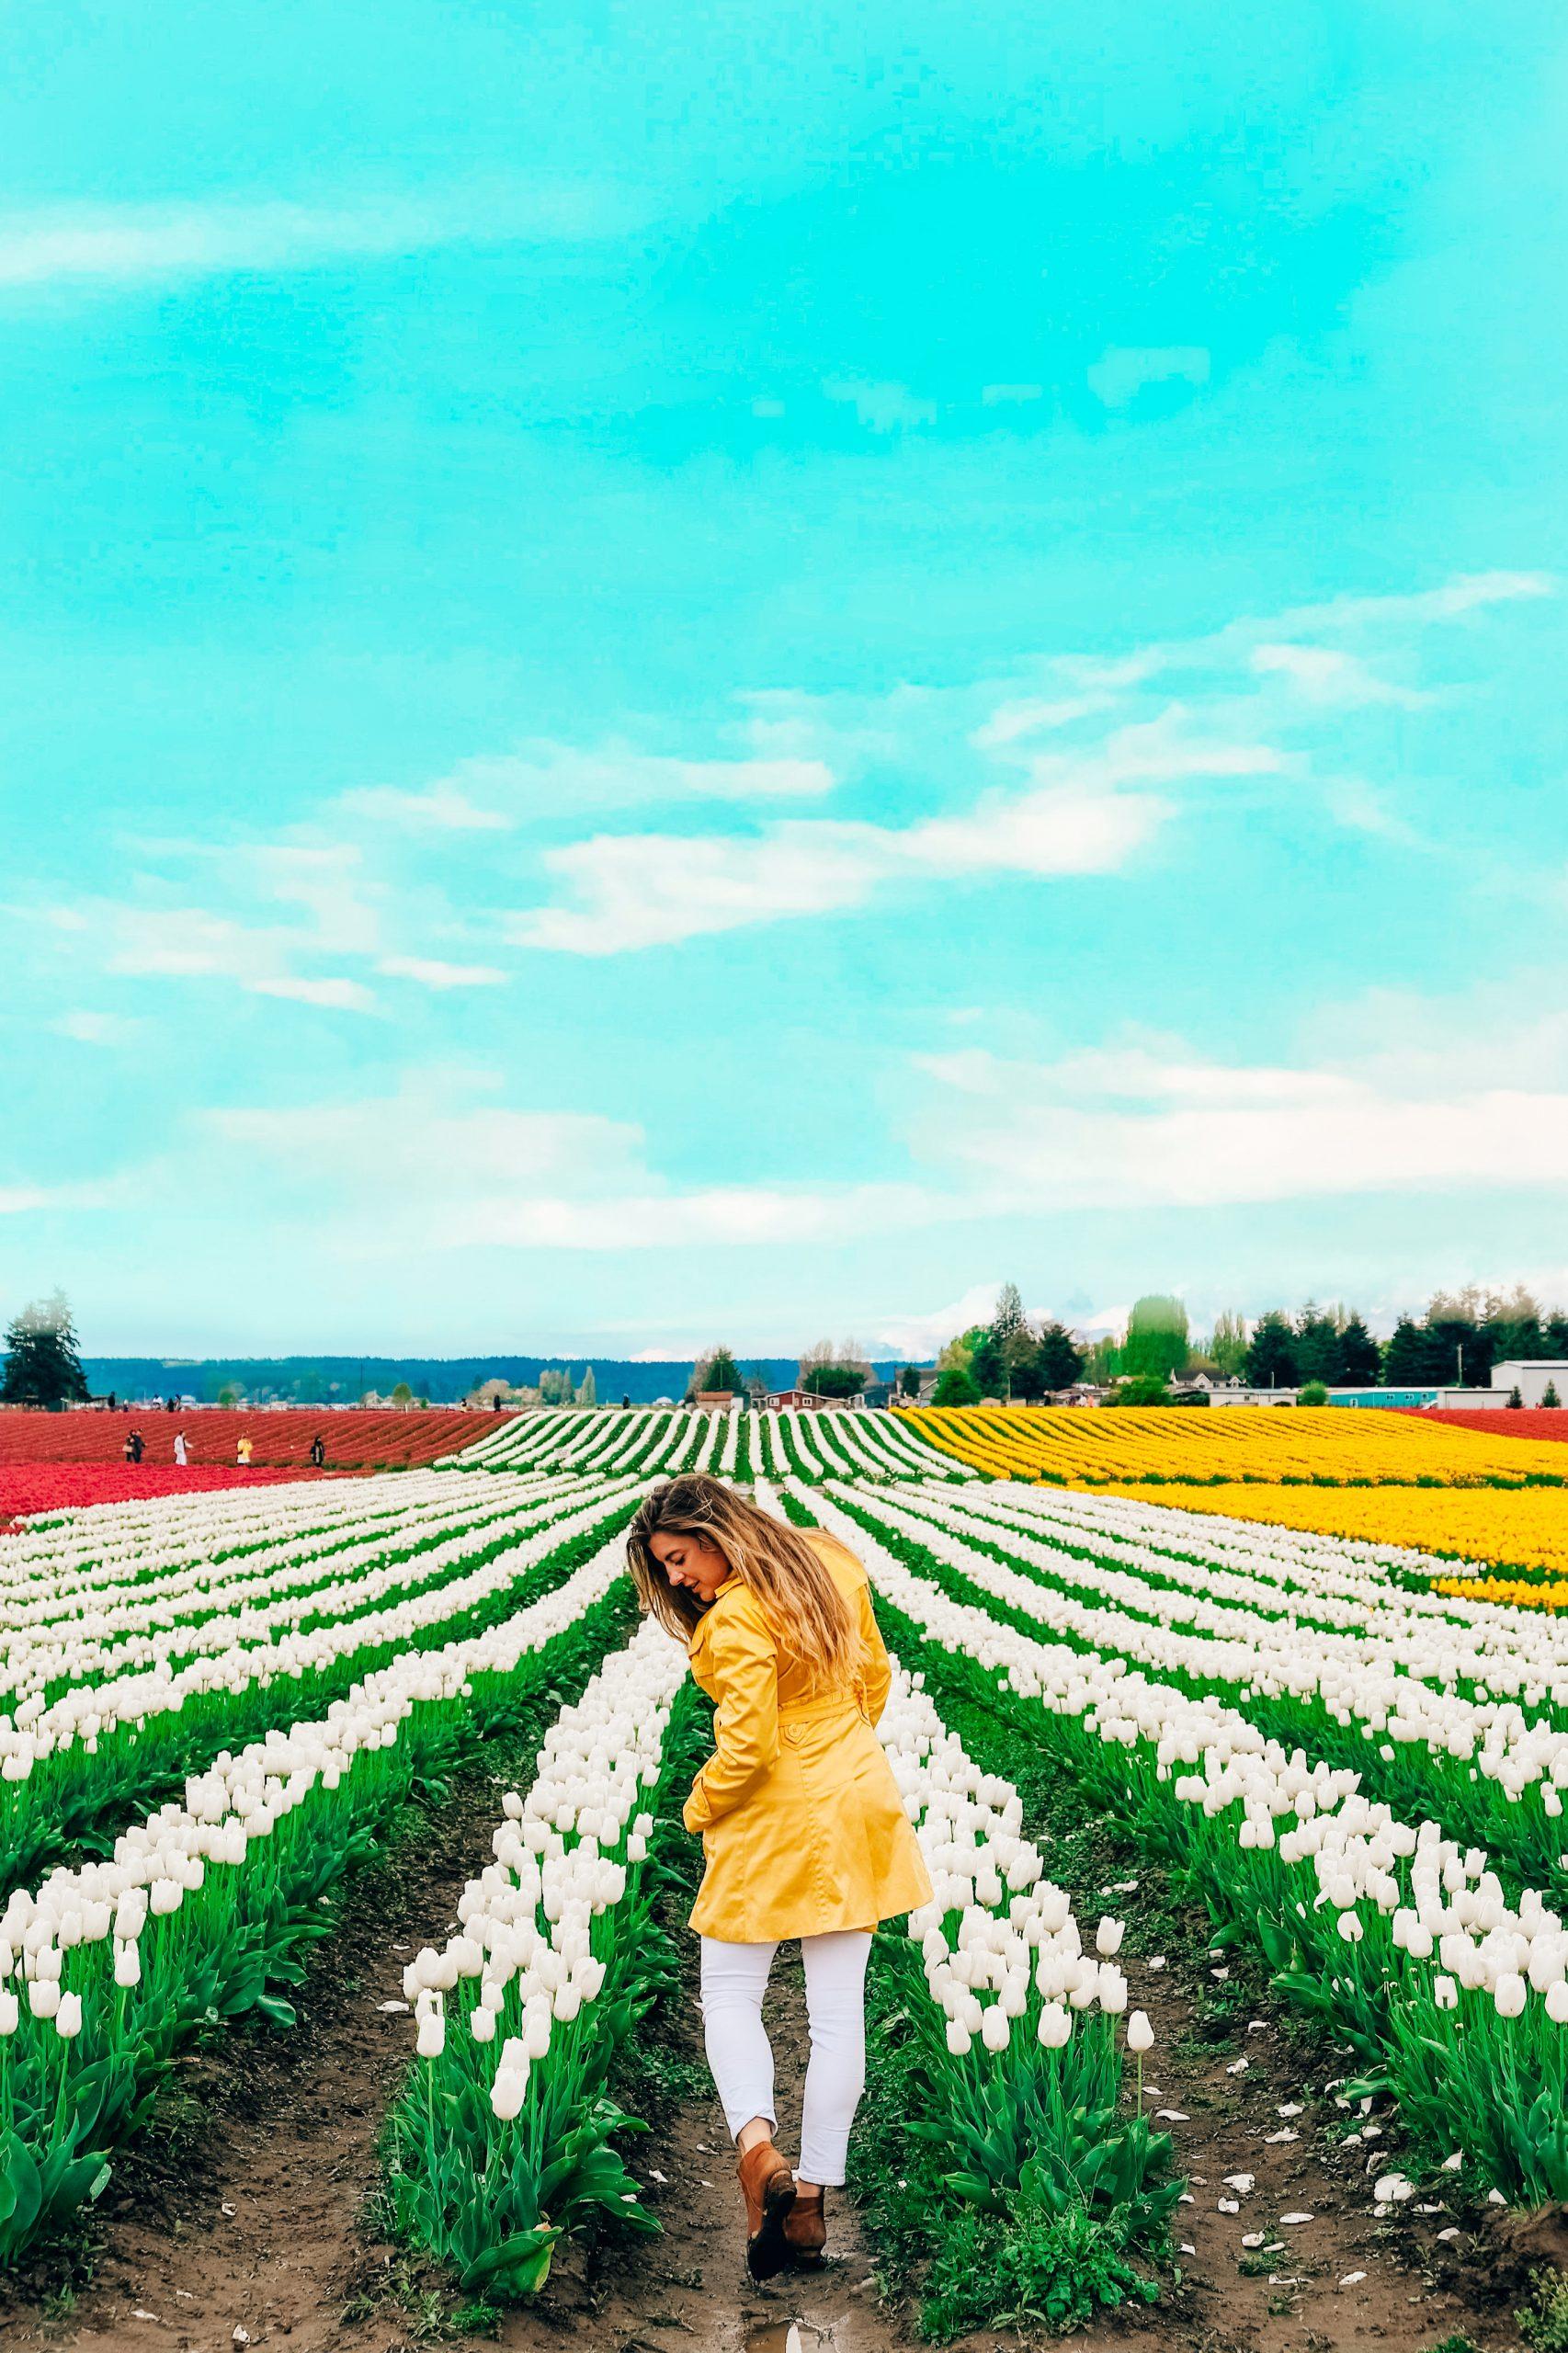 The Tulip Festival of Skagit Valley